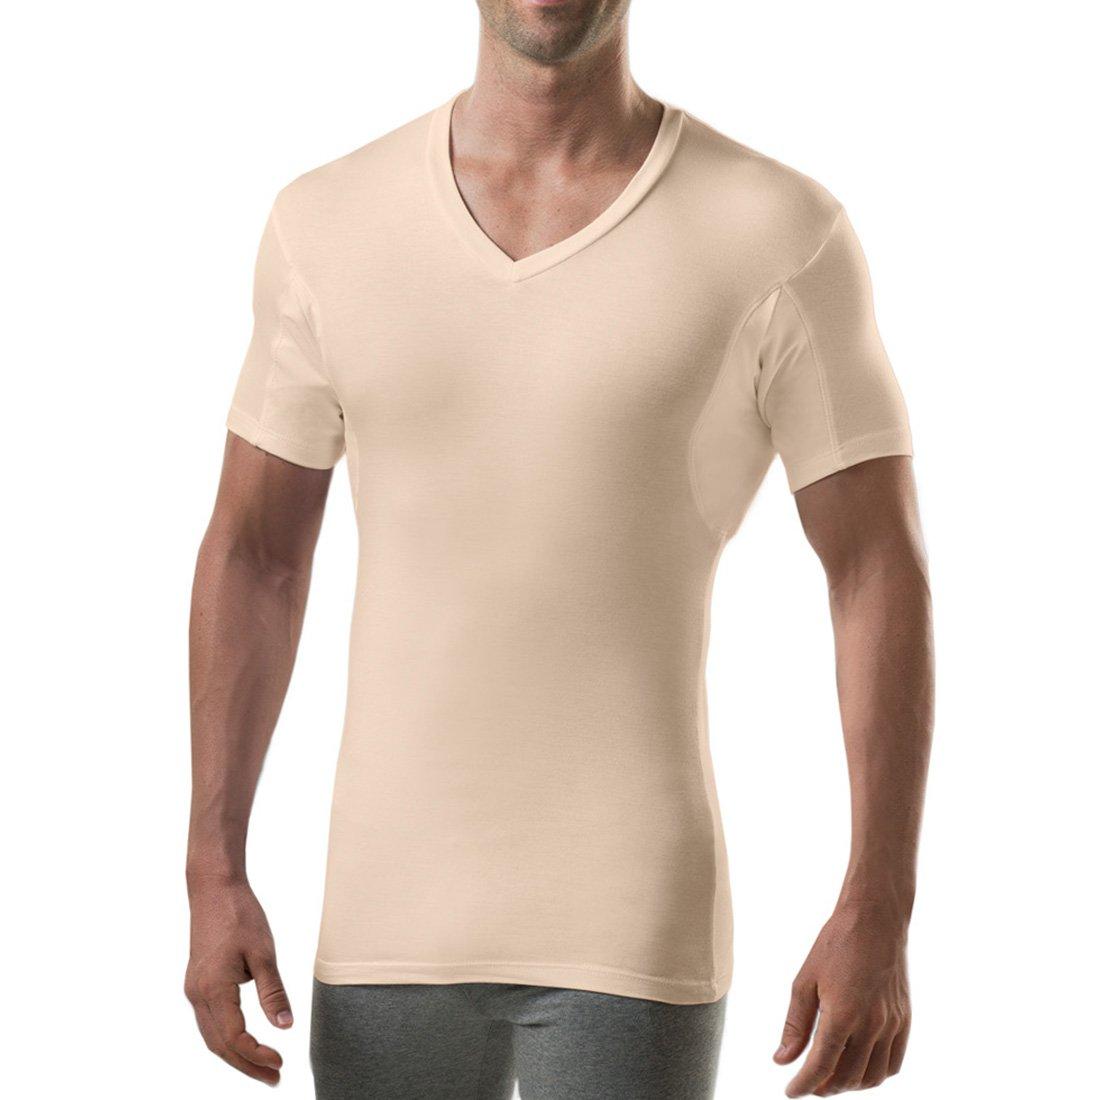 56dbcba50d48 Sweatproof Undershirt for Men with Underarm Sweat Pads (Slim Fit, V-Neck)